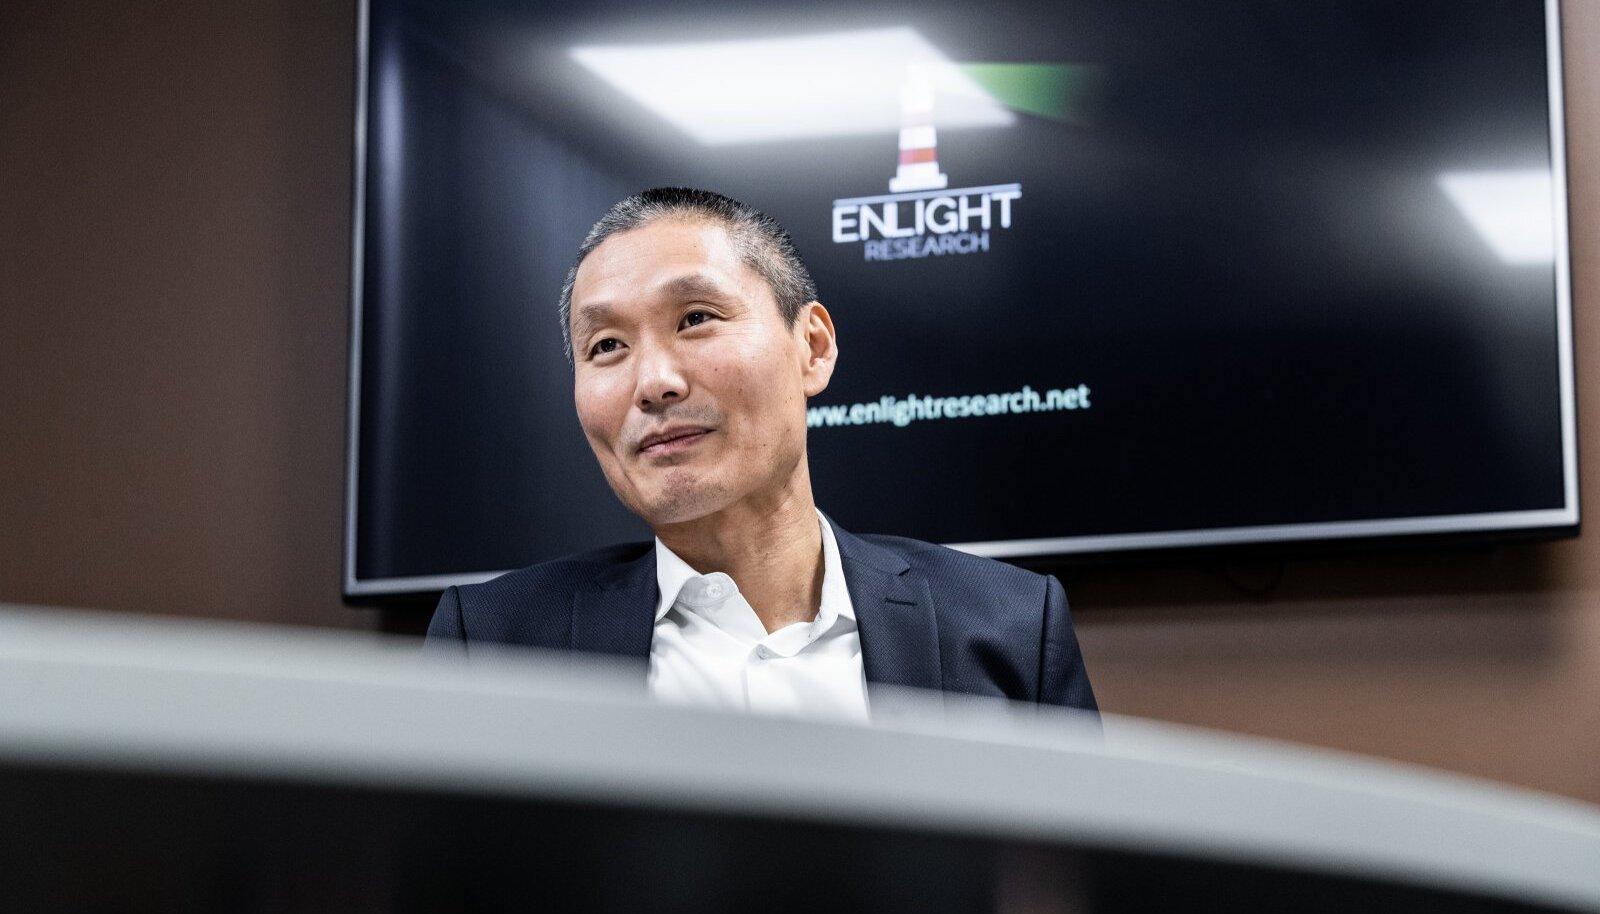 Enefit Green pakub aktsiaid atraktiivse hinnaga, ütles Enlight Researchi analüütik Mattias Wallander.